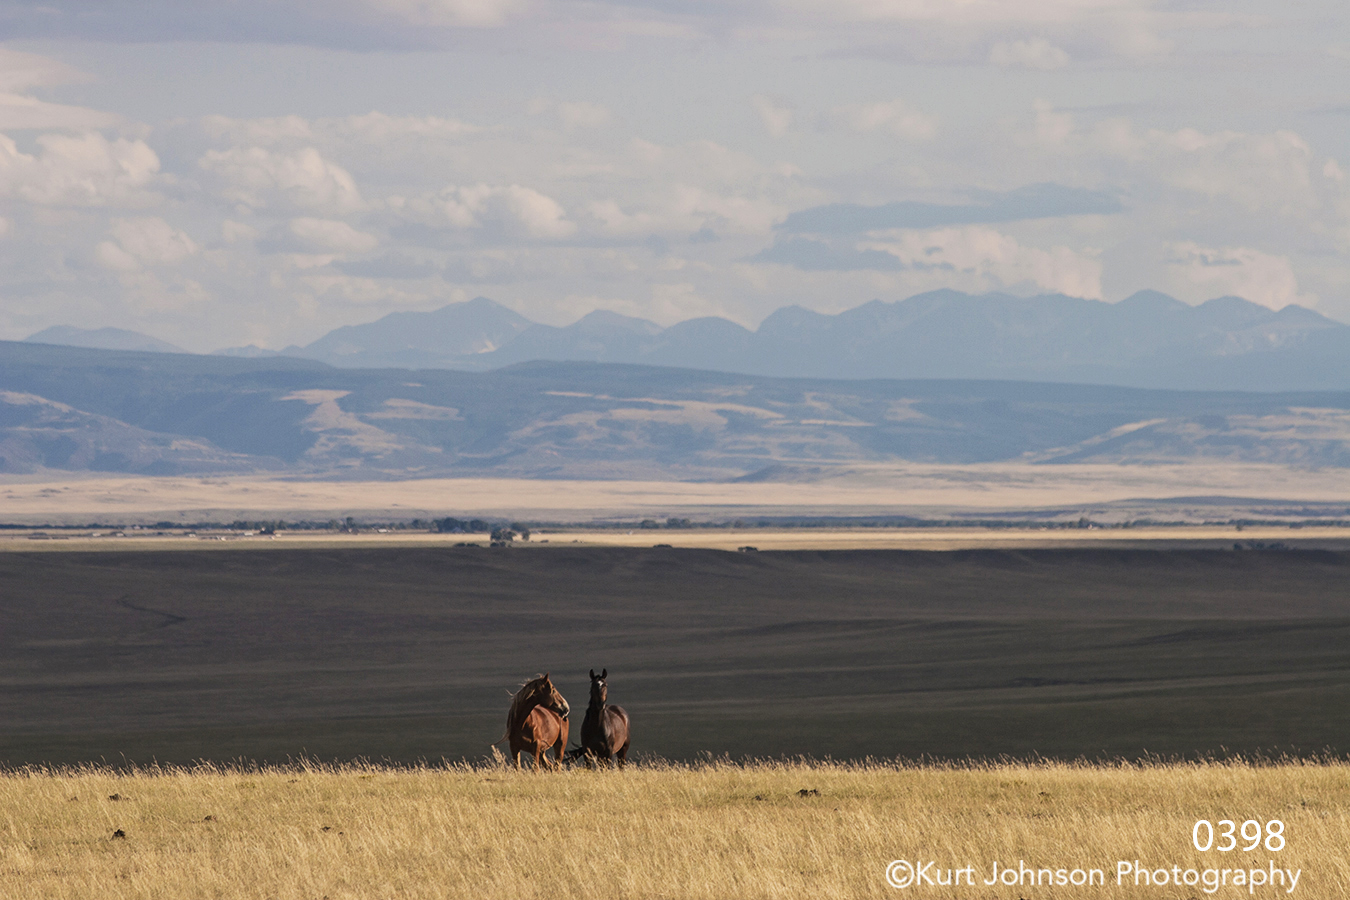 landscape mountains wildlife horses grasses